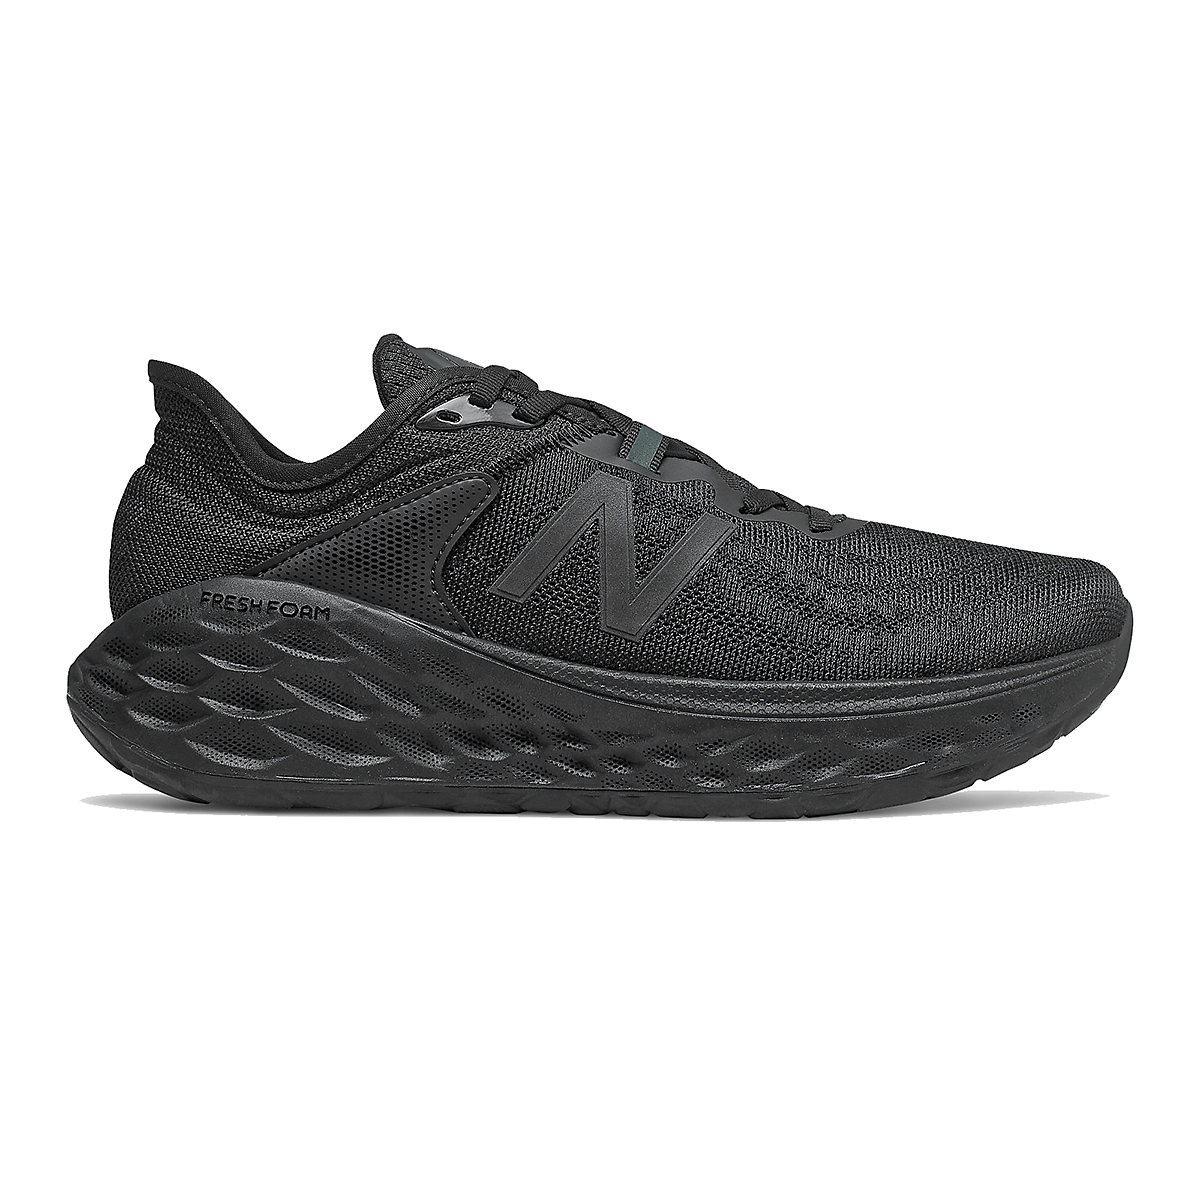 Women's New Balance Fresh Foam More V2 Running Shoe - Color: Black - Size: 6 - Width: Extra Wide, Black, large, image 1